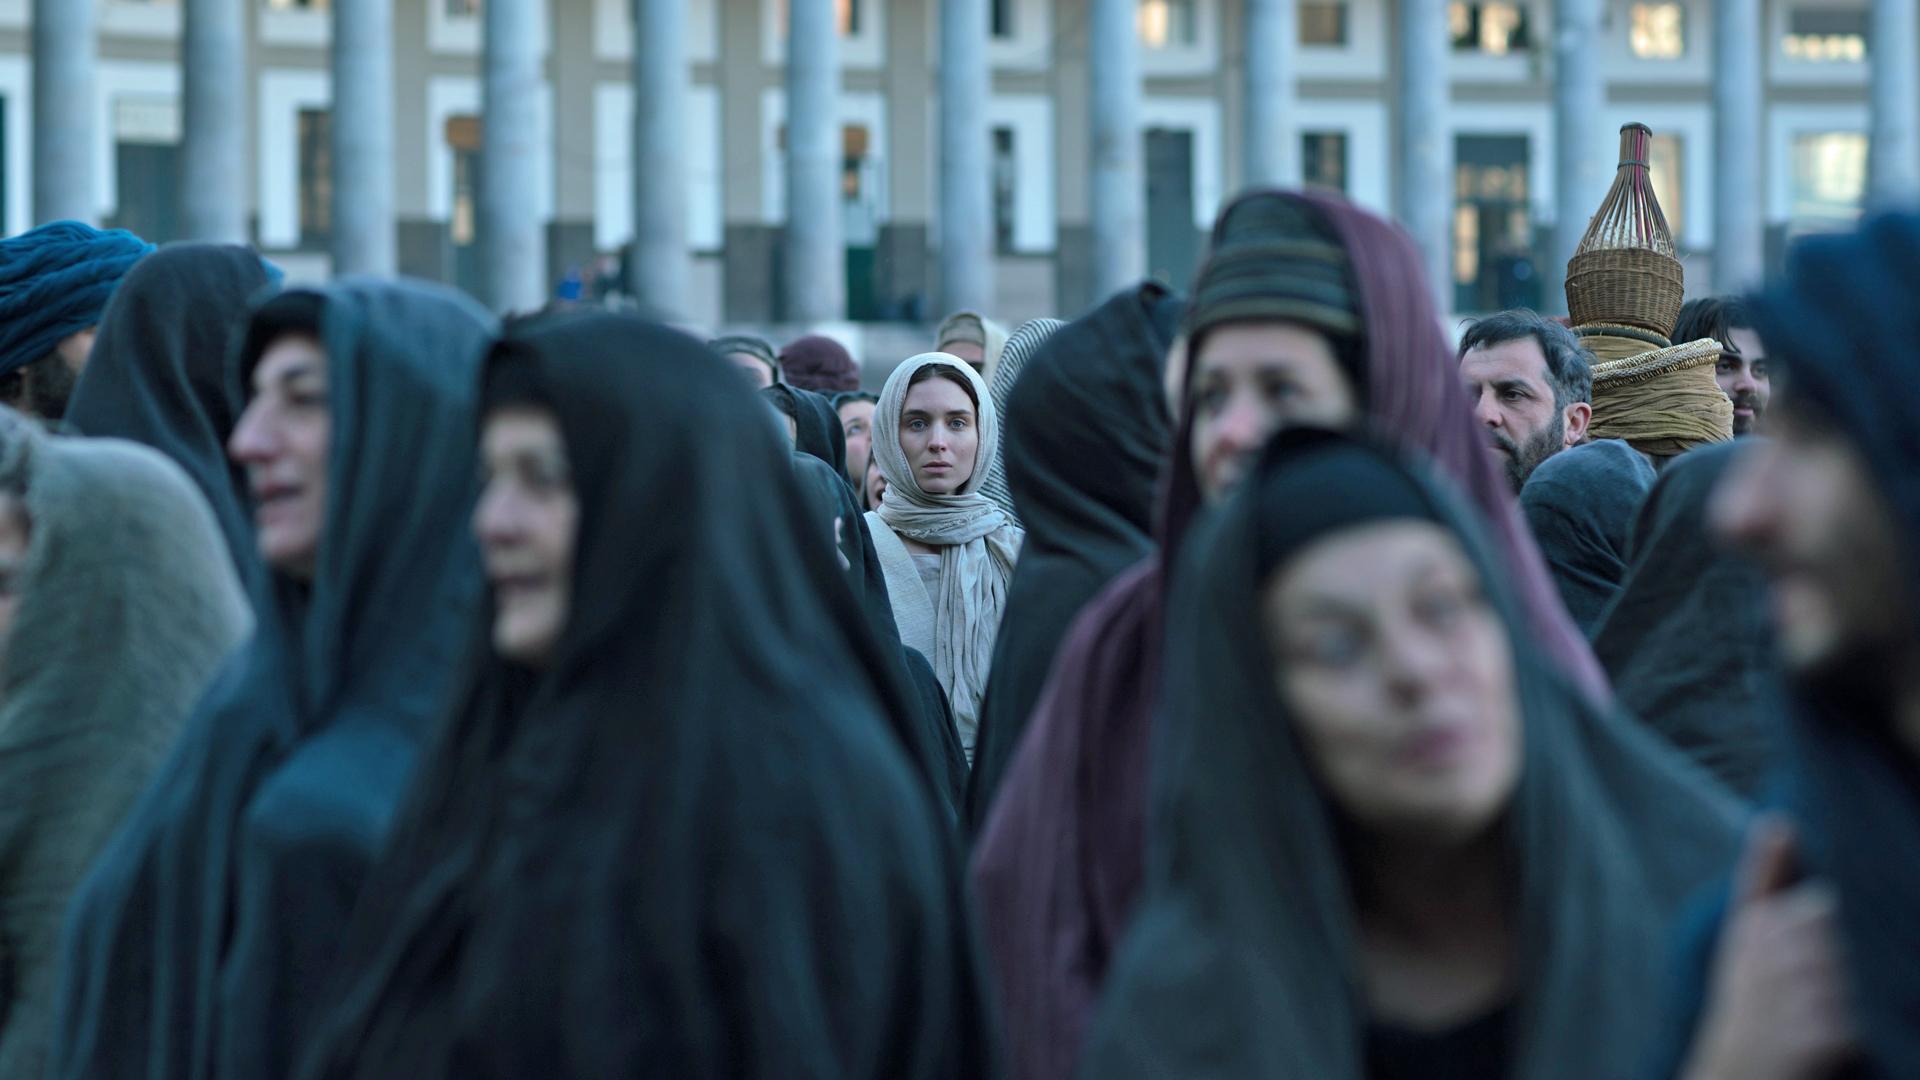 Hollywoodstar Rooney Mara spielt in Maria Magdalena die Hauptfigur